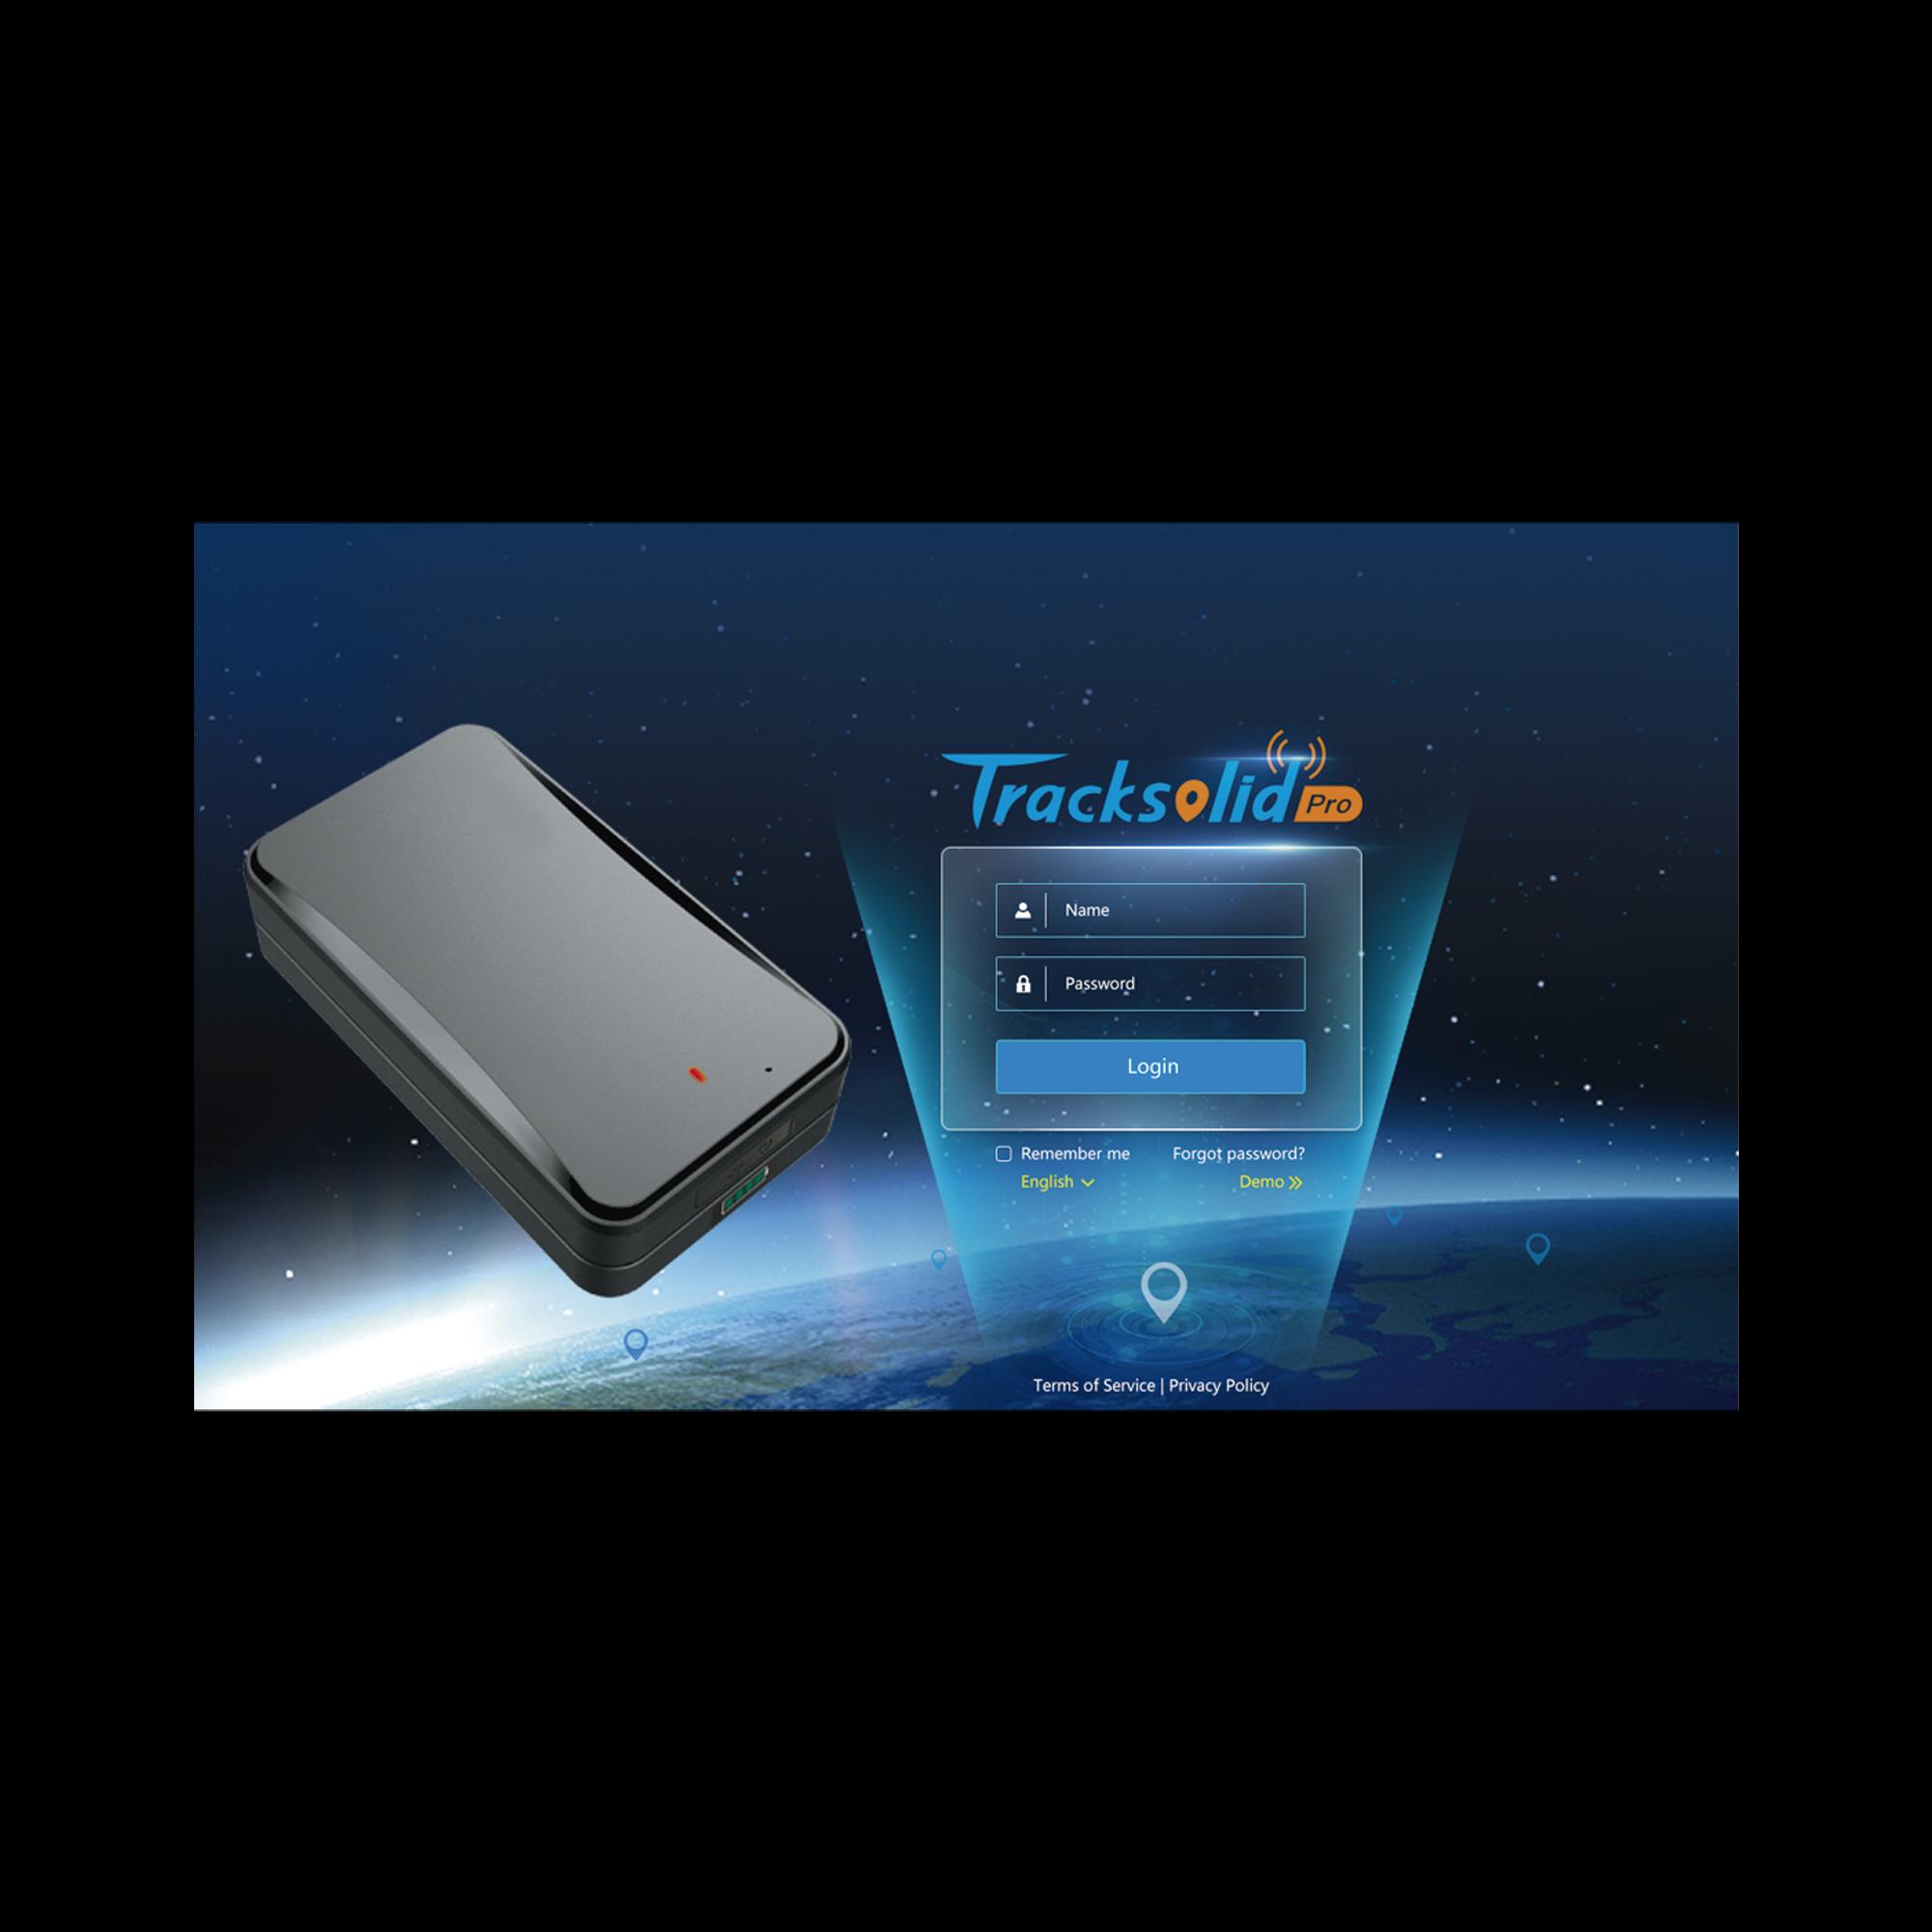 Kit de localizador vehicular que incluye un GPS modelo AT6 + primer licencia de plataforma TRACKSOLIDPRO